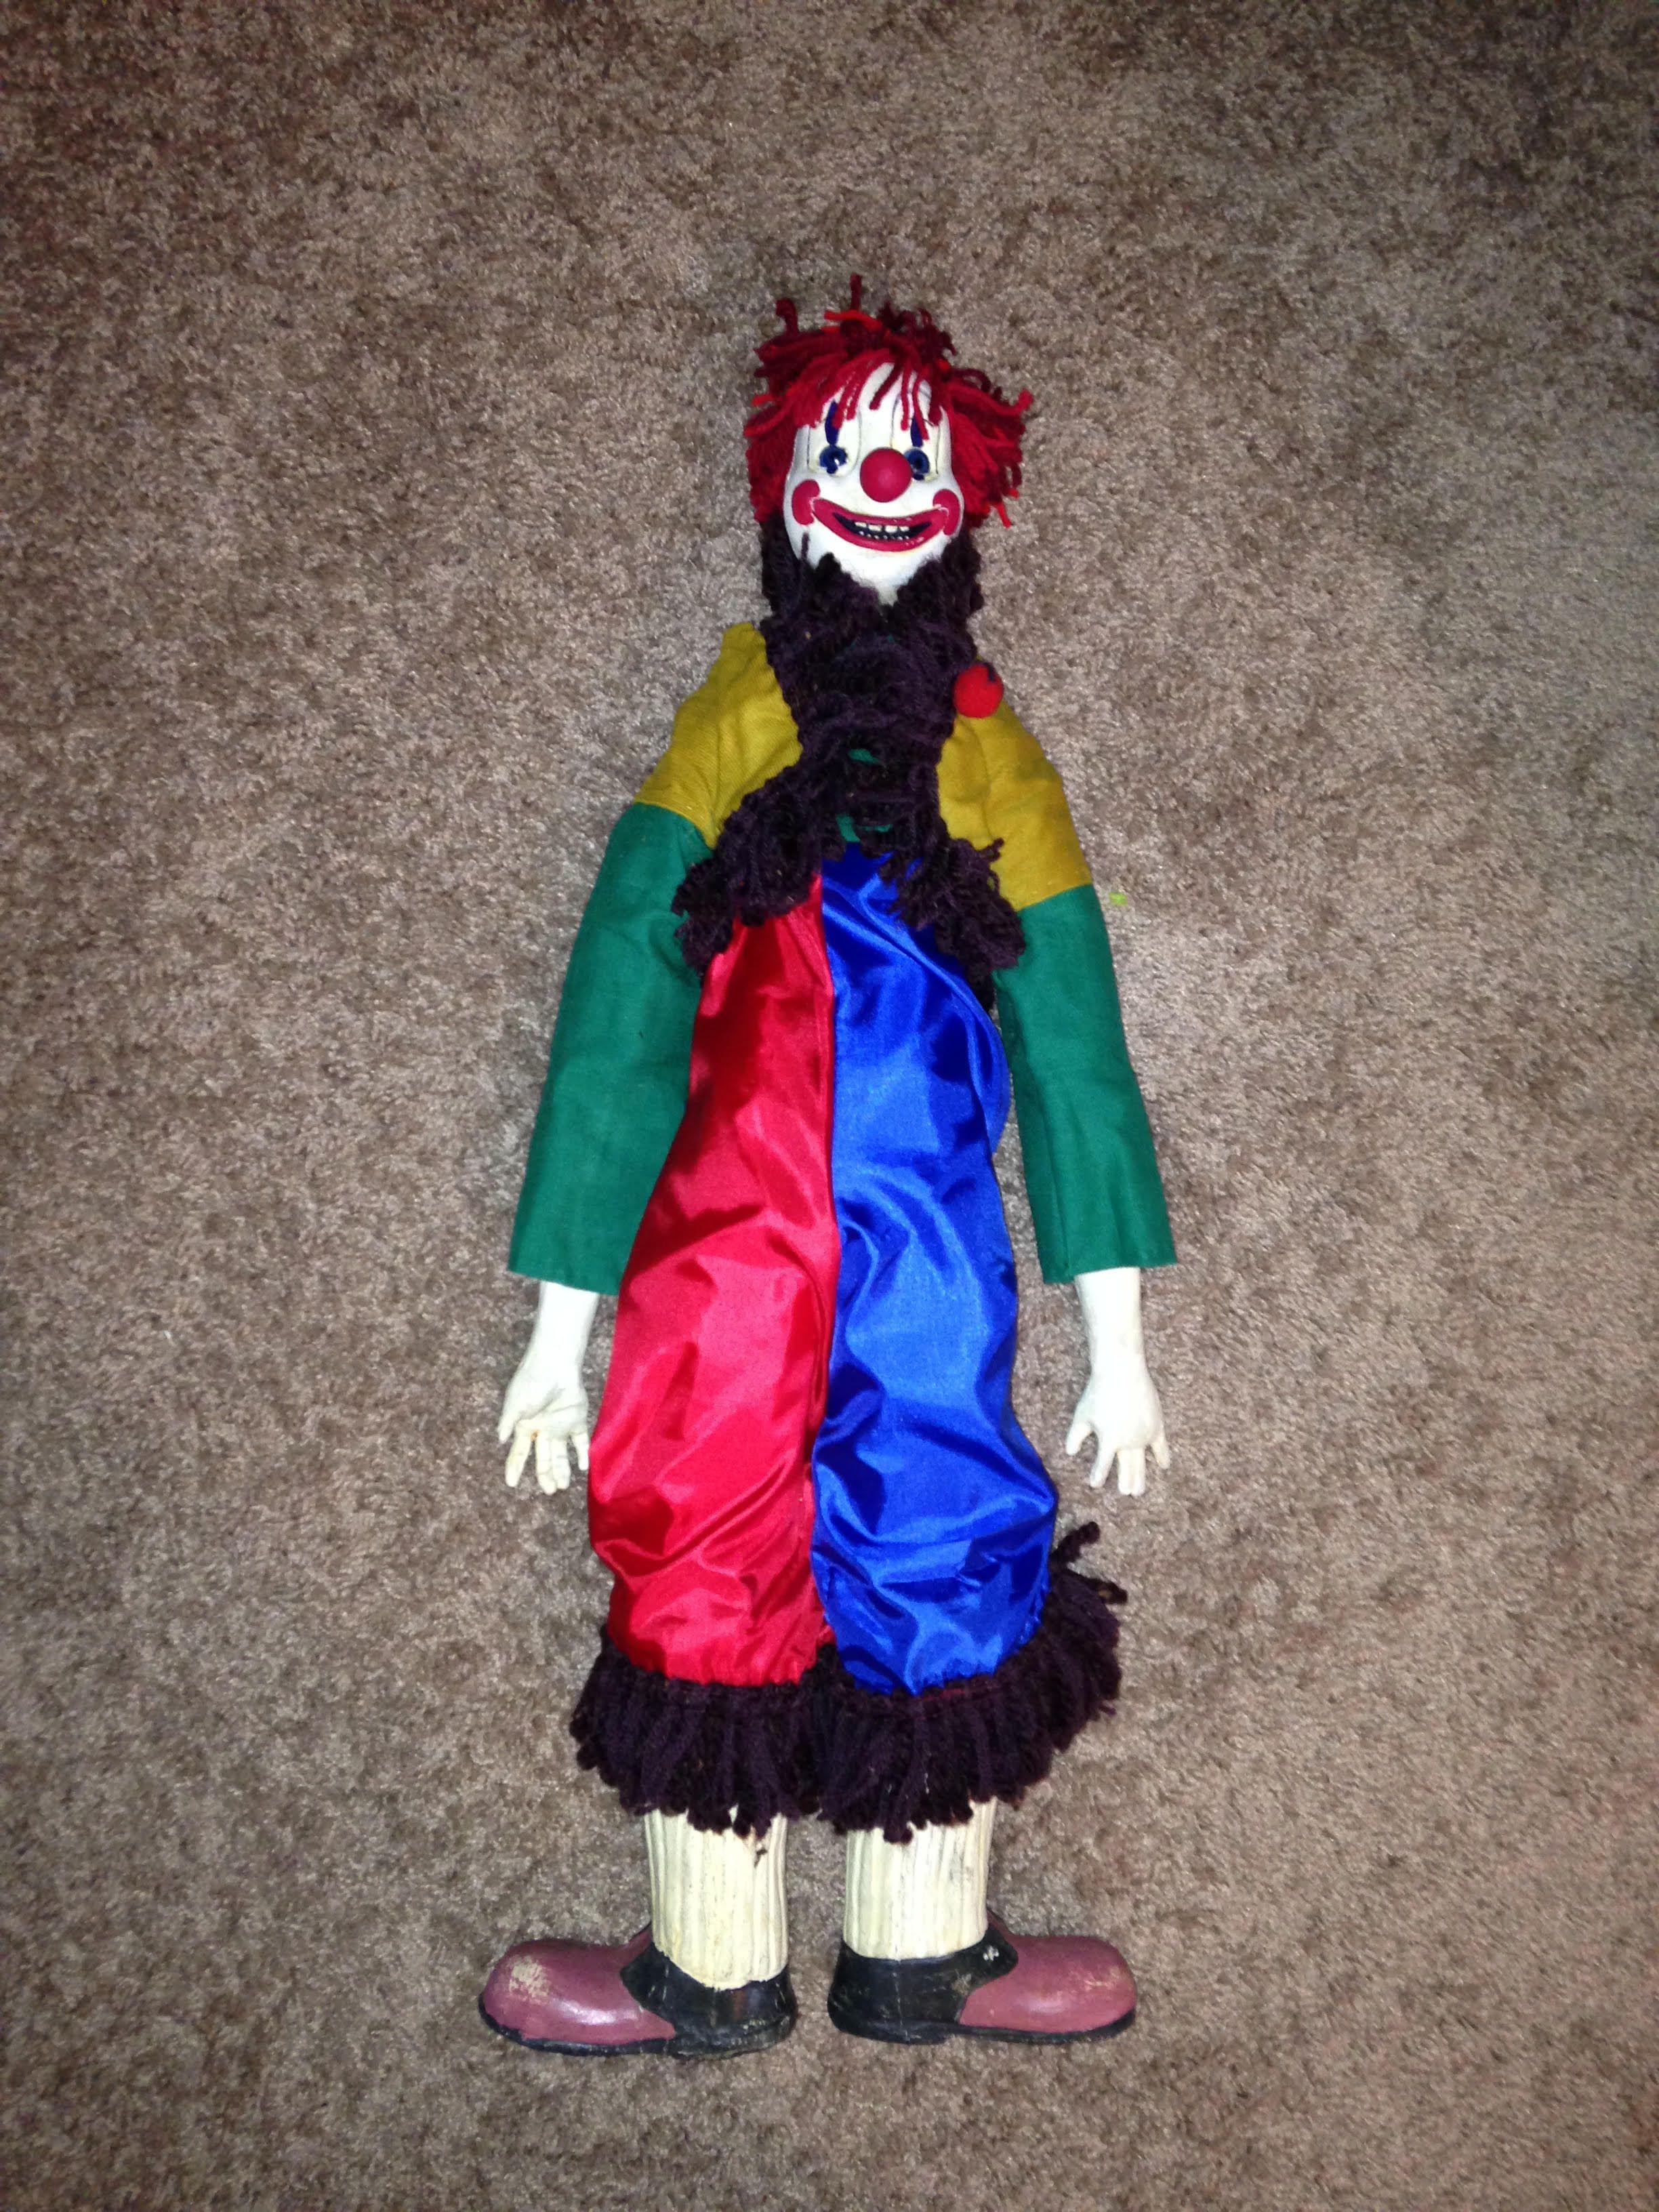 Clown Creepy Poltergeist Doll